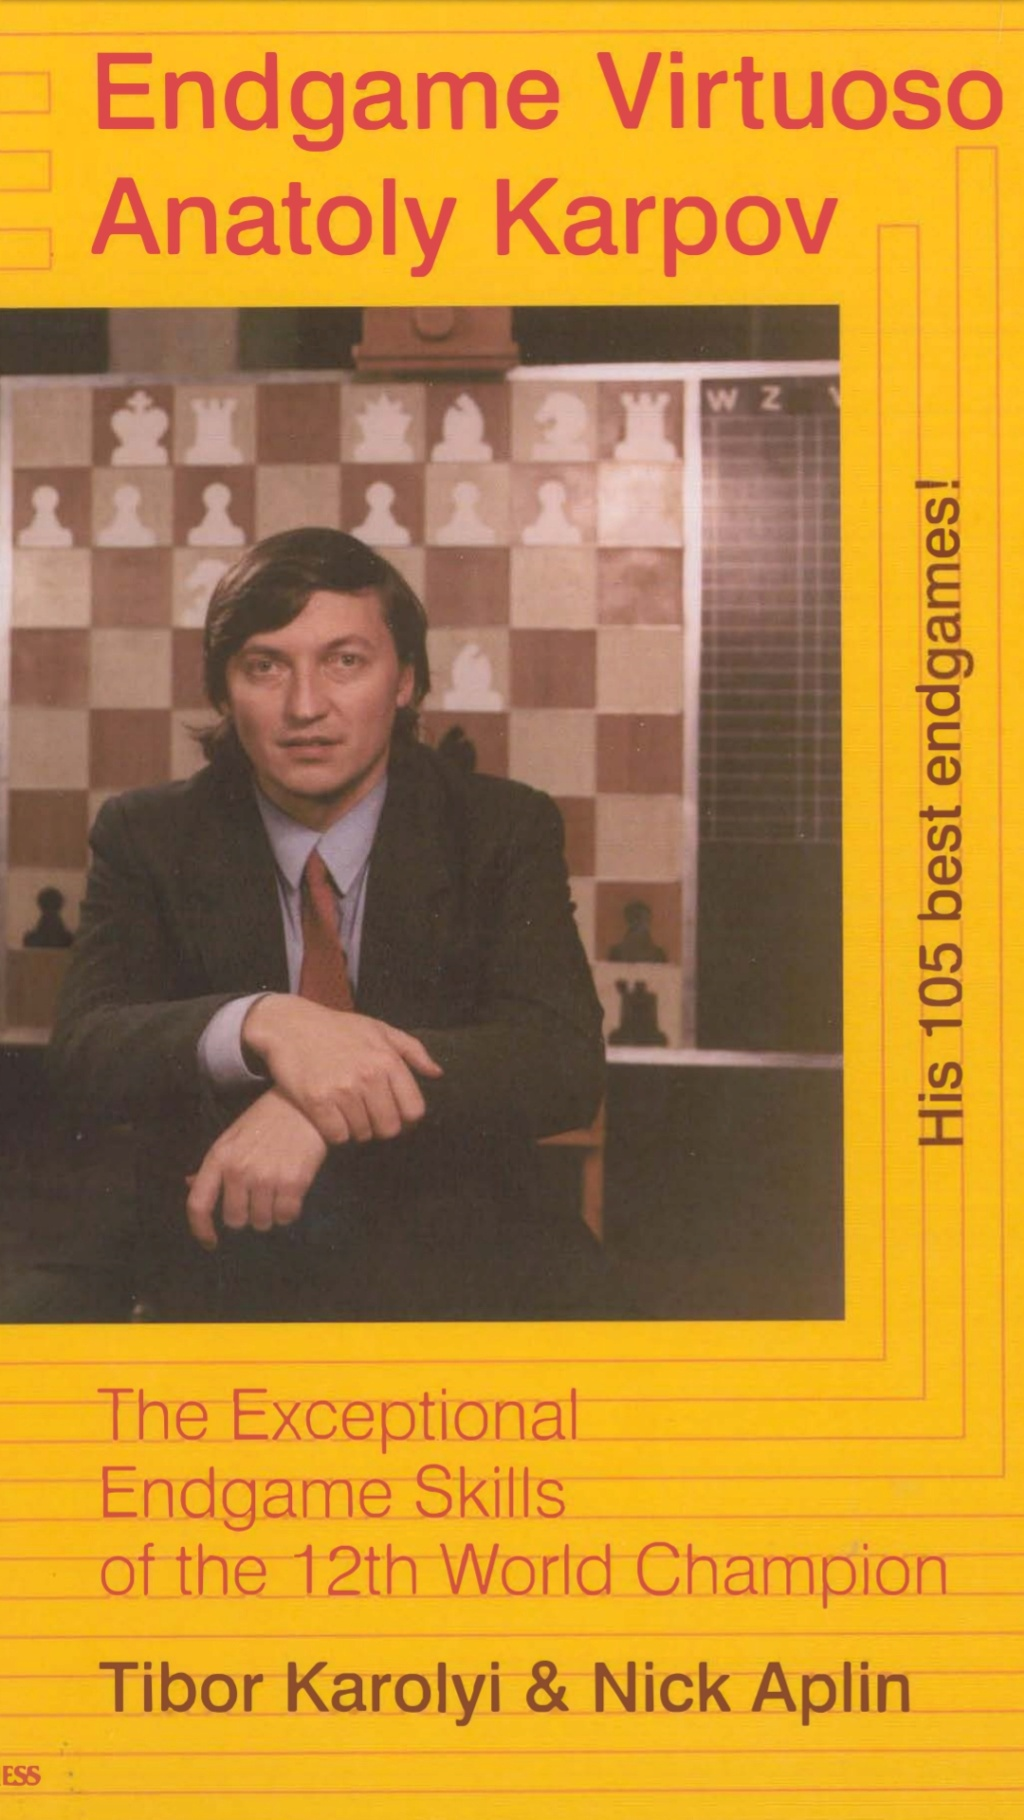 Endgame Virtuoso: Anatoly Karpov  Book by Nick Aplin and Tibo Scree120